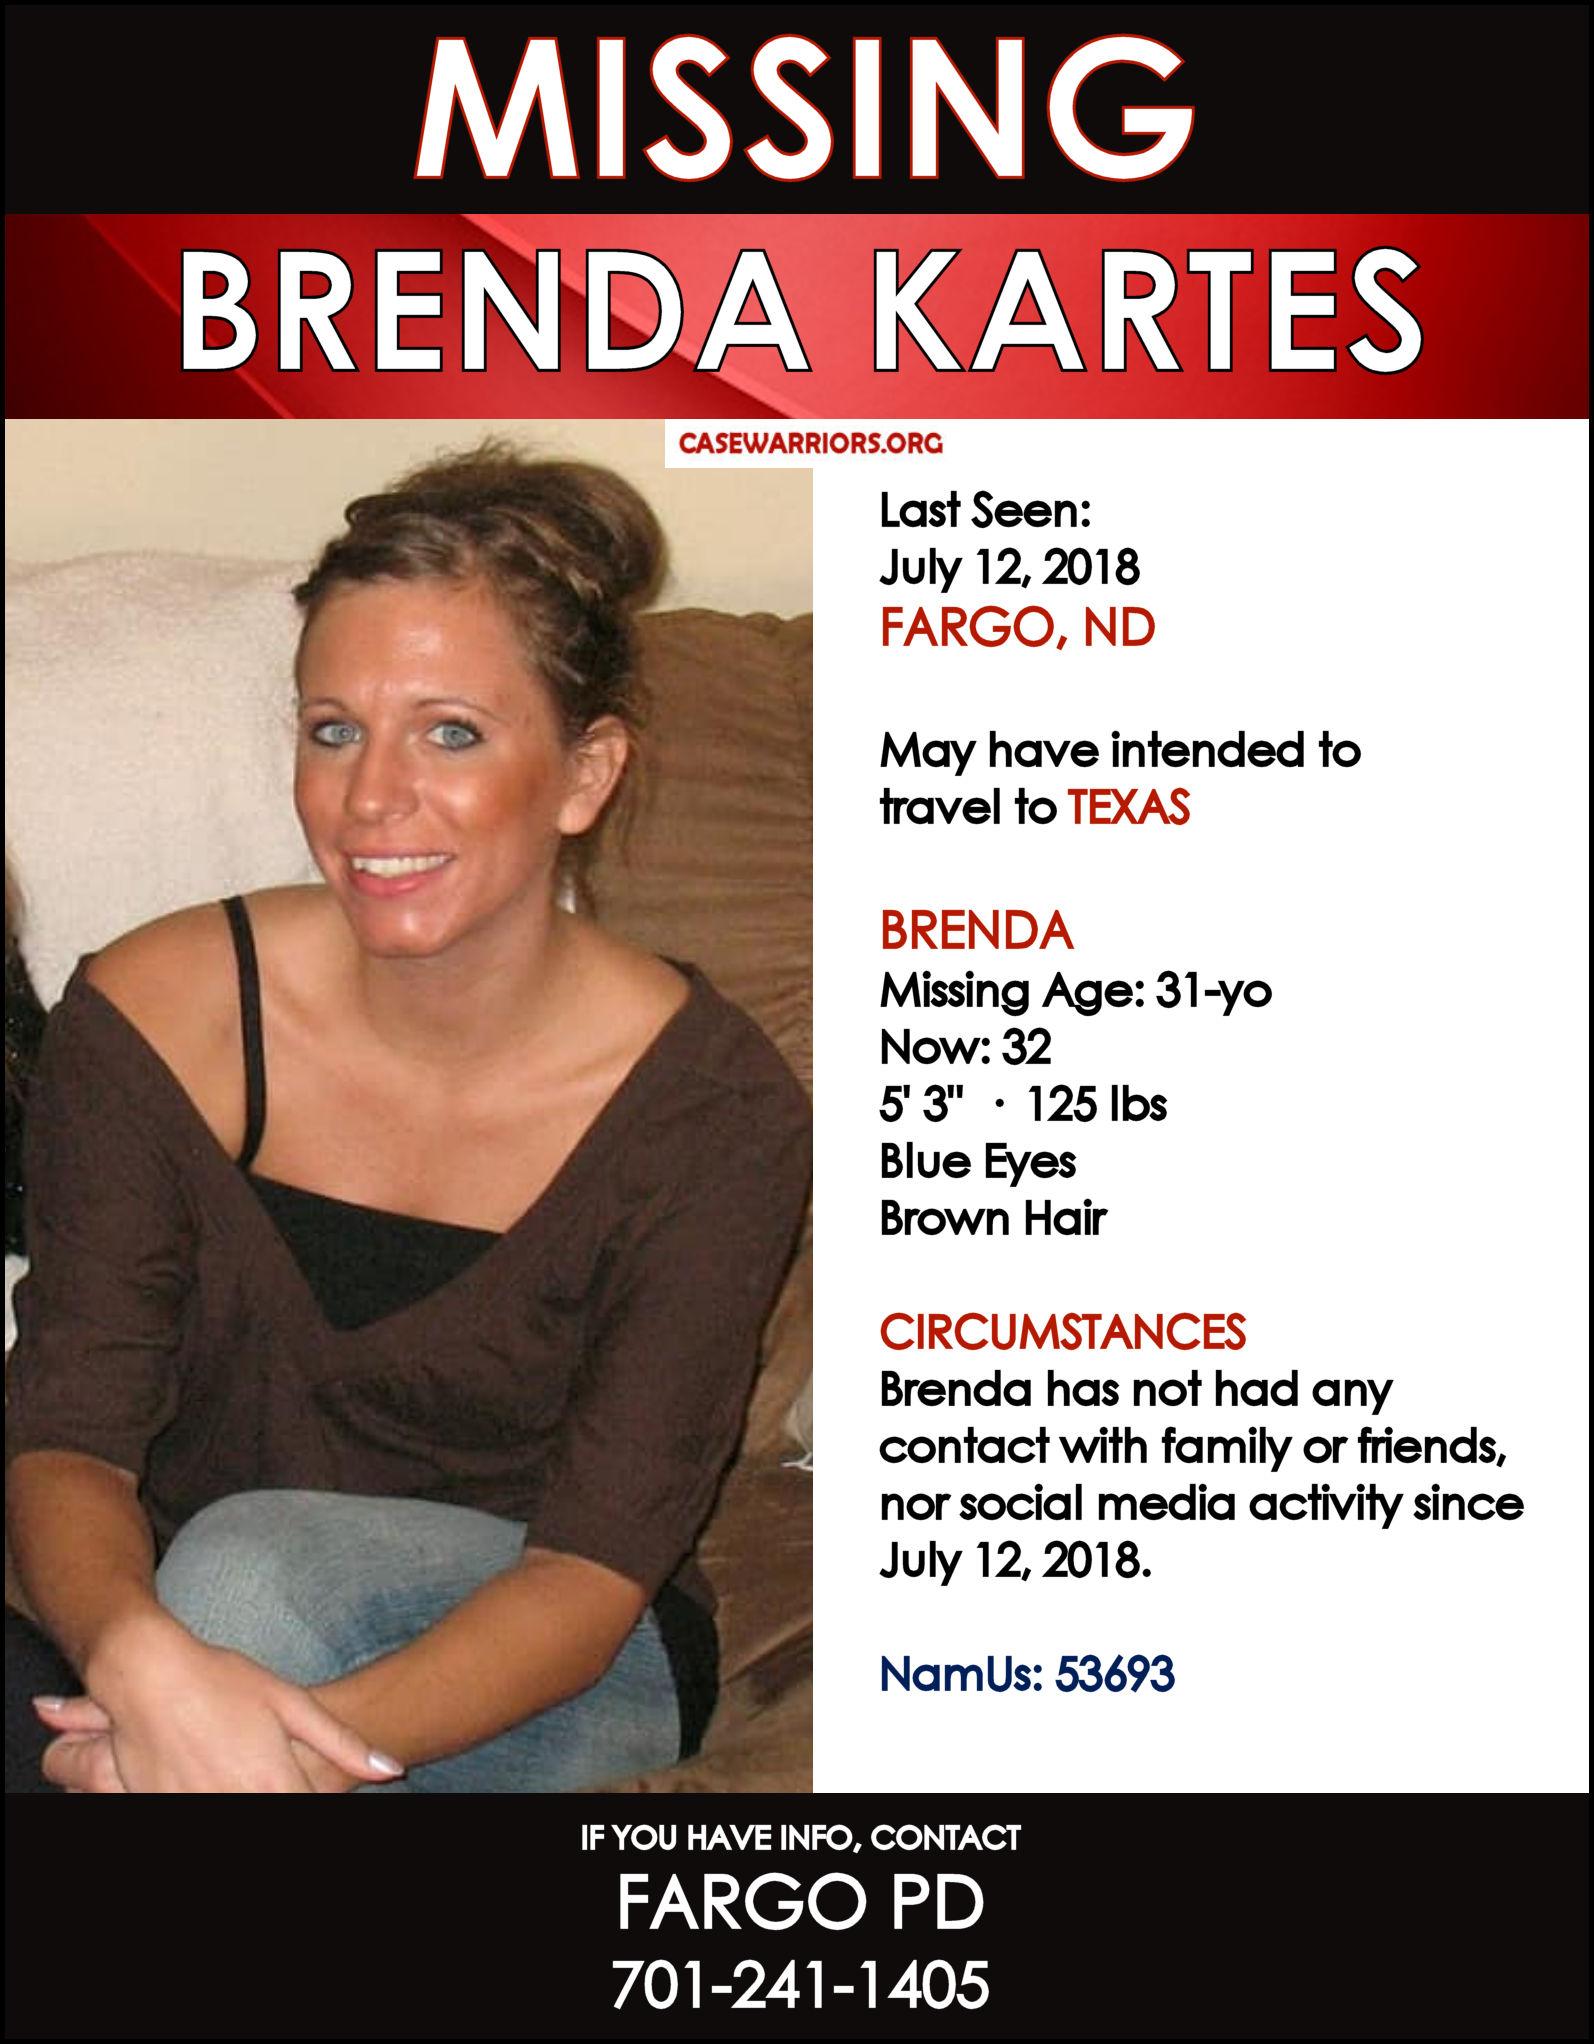 BRENDA KARTES